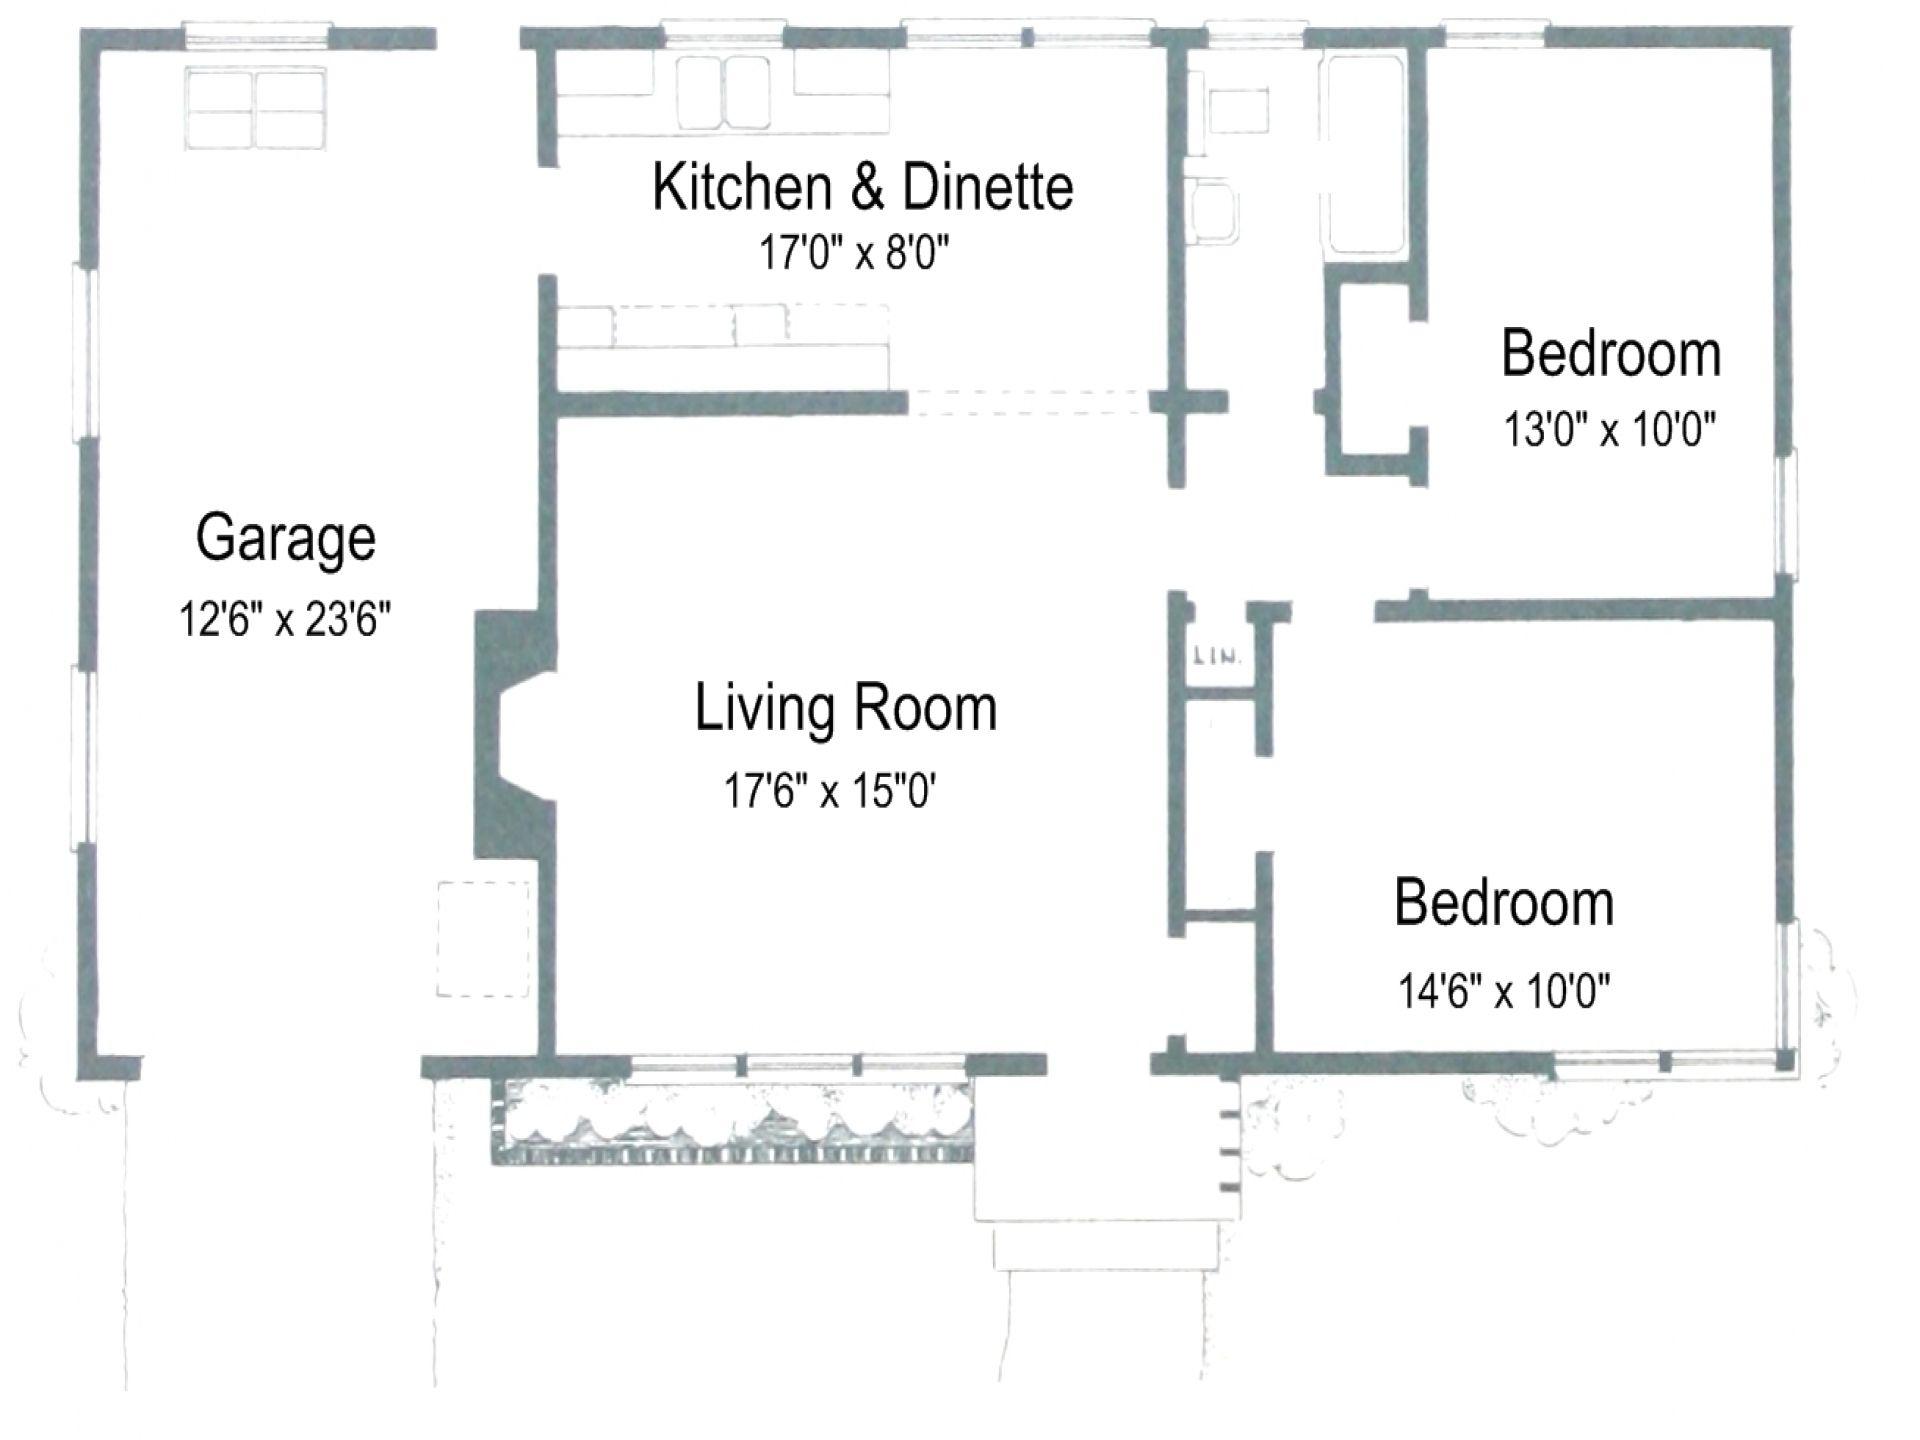 4 2 bedroom 2 bath 2 car garage modern floor plansmodern house